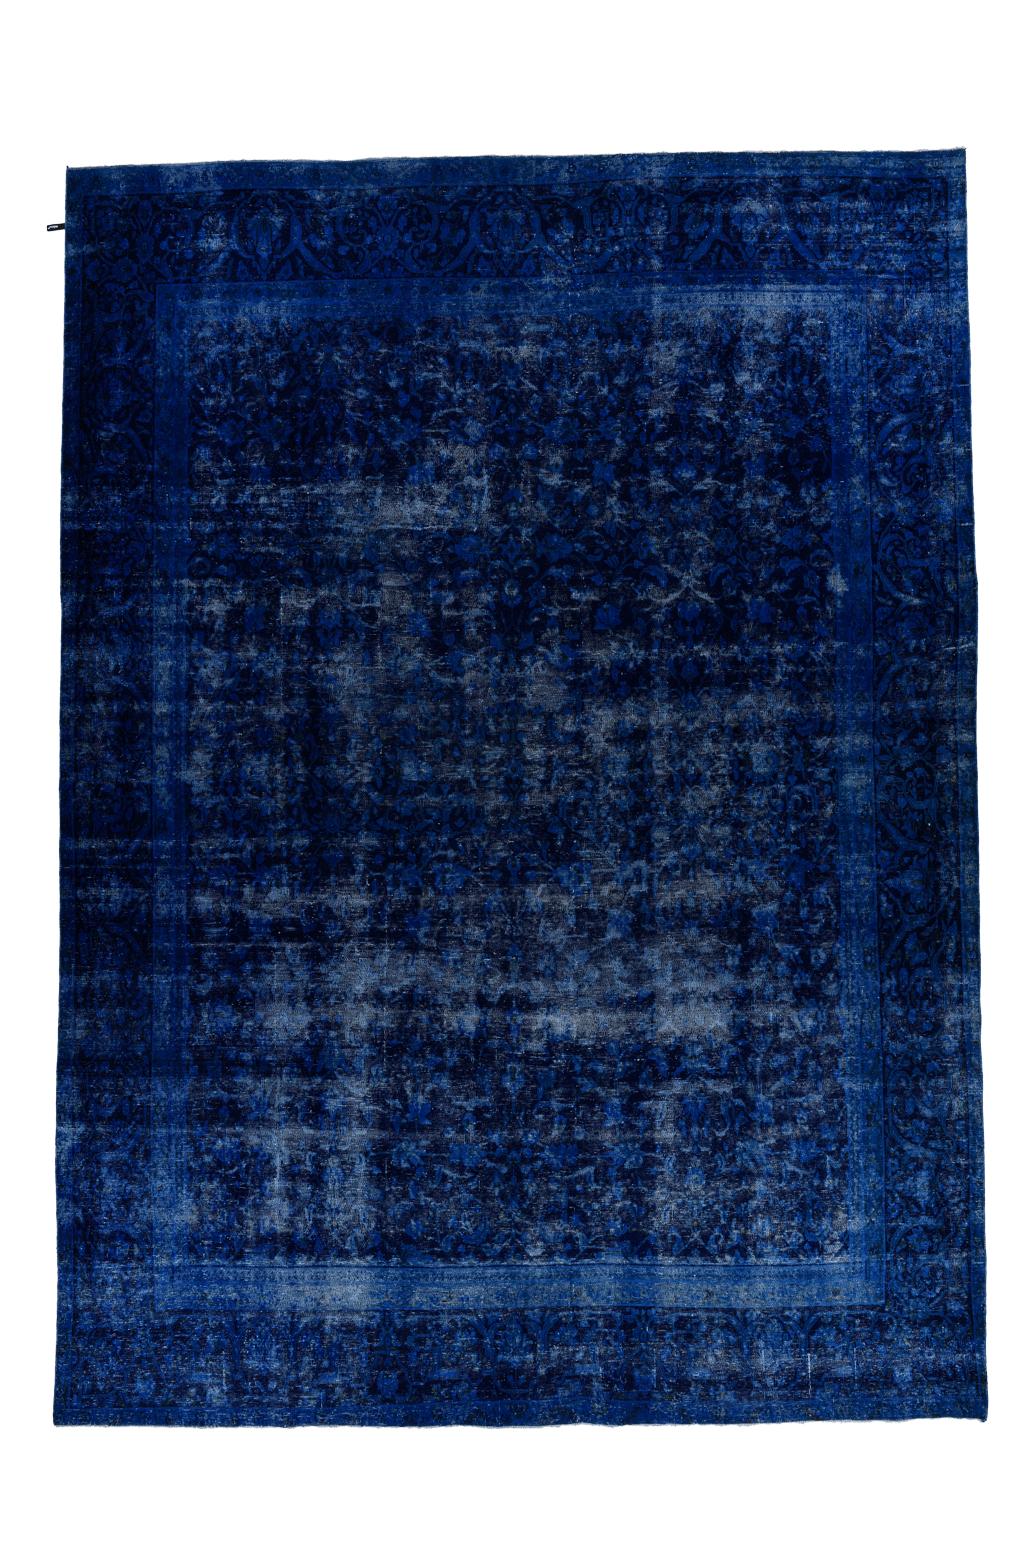 ID 2076 Pure 2.0 blue 275 x 380 cm